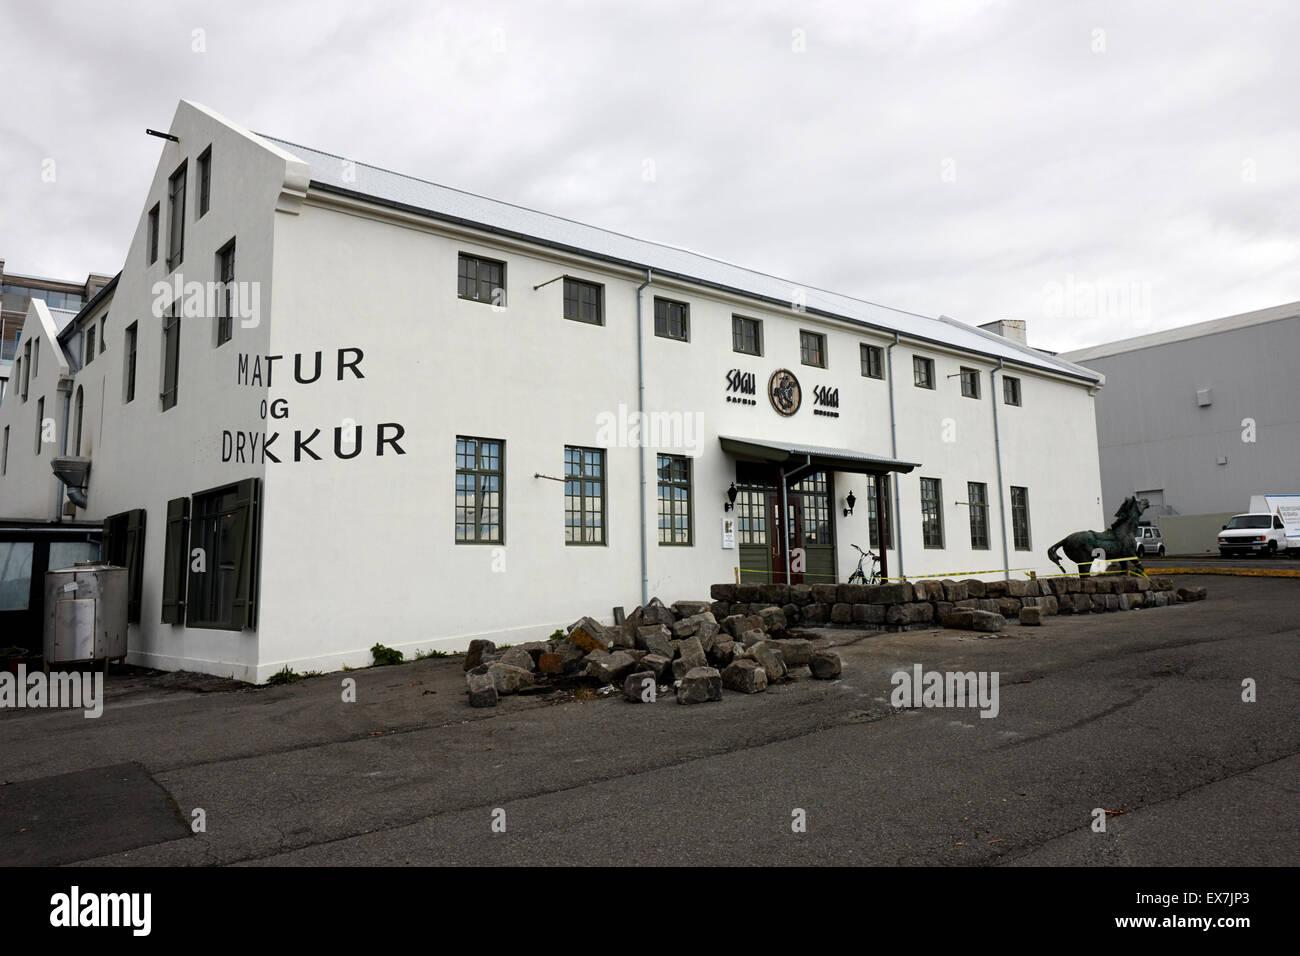 the saga museum reykjavik iceland - Stock Image